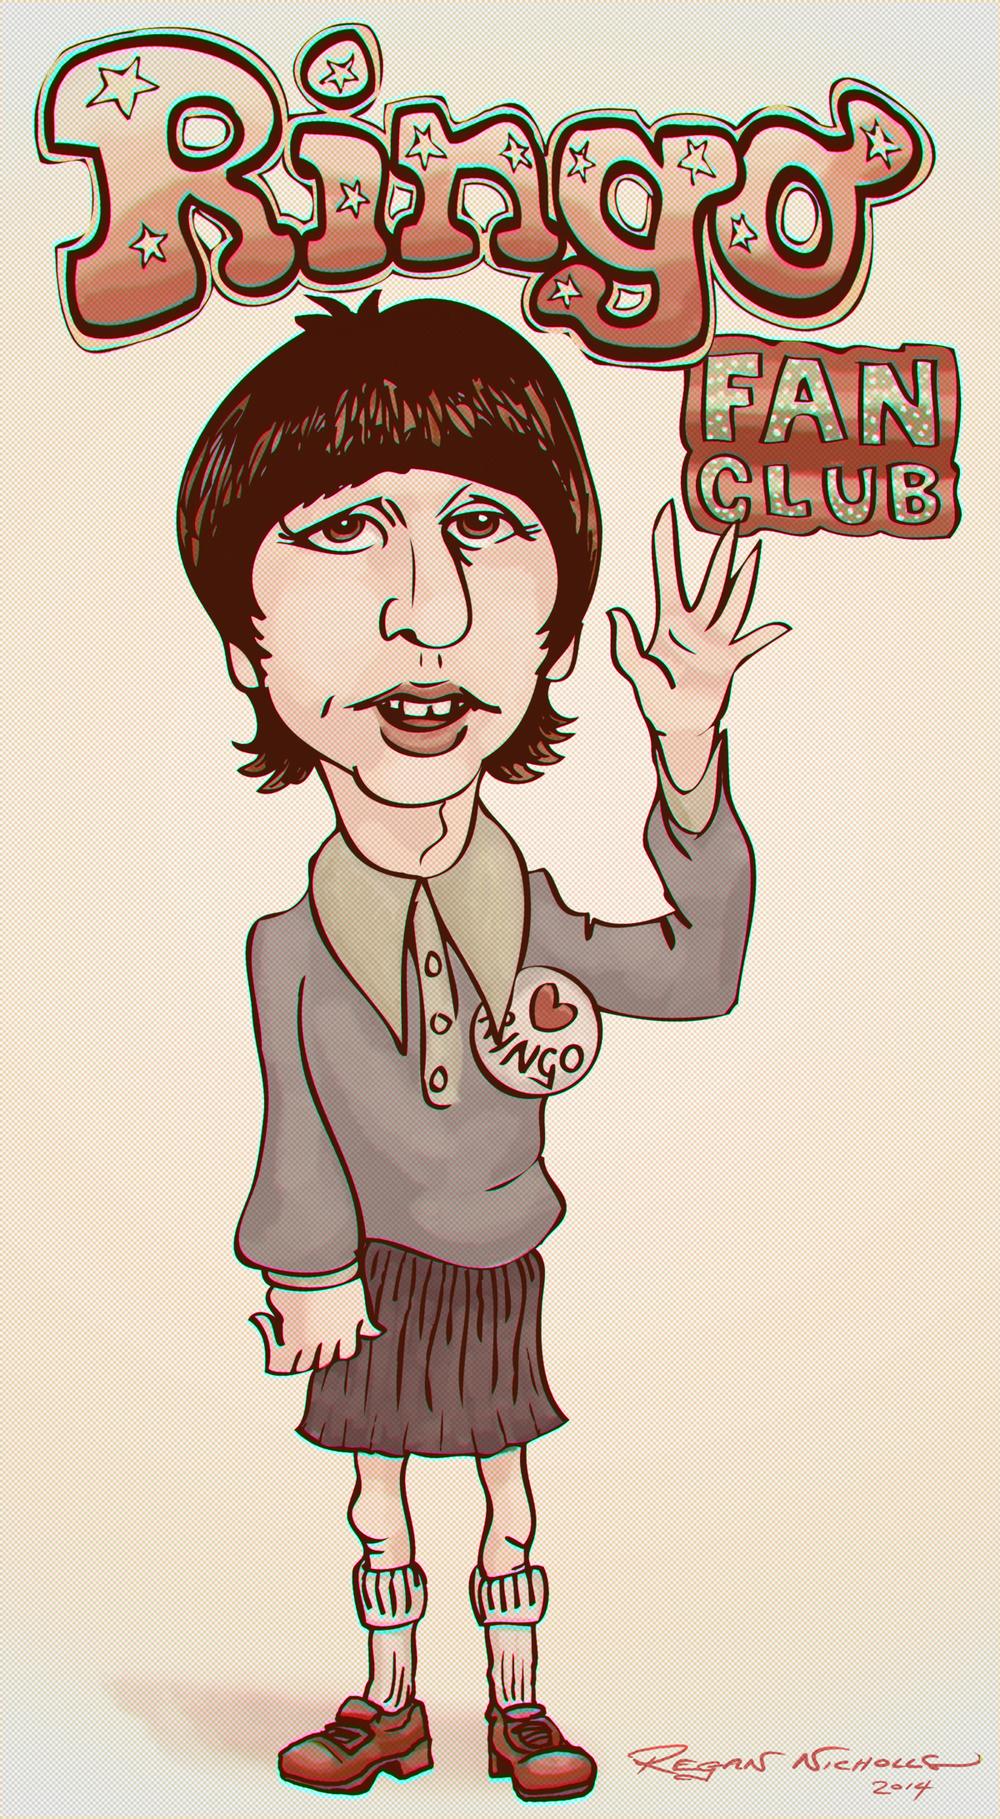 RingoFanClub. jpeg